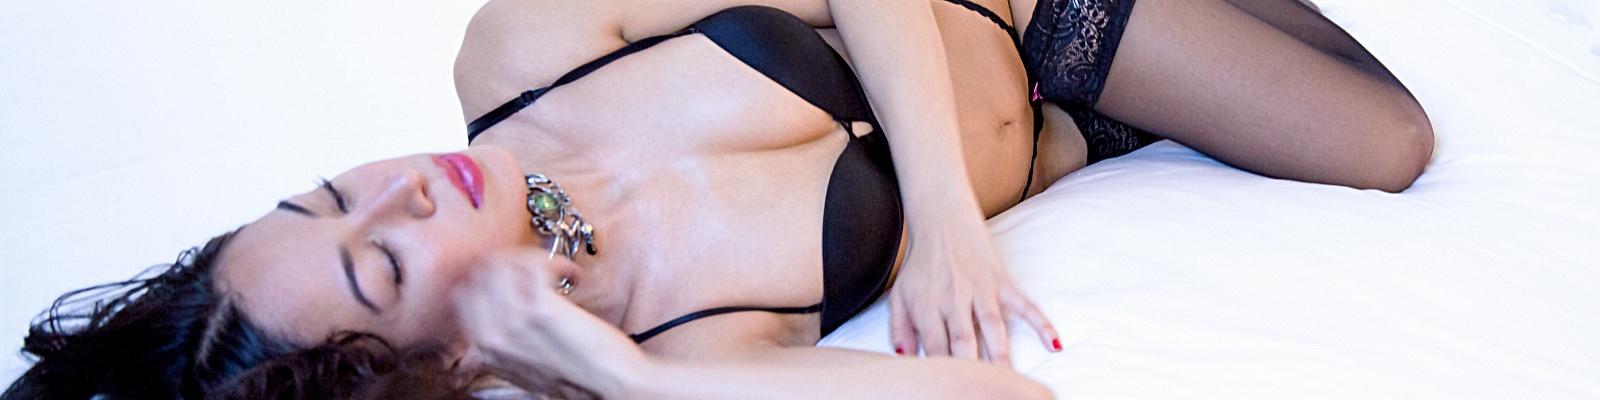 Giselle Valais's Cover Photo